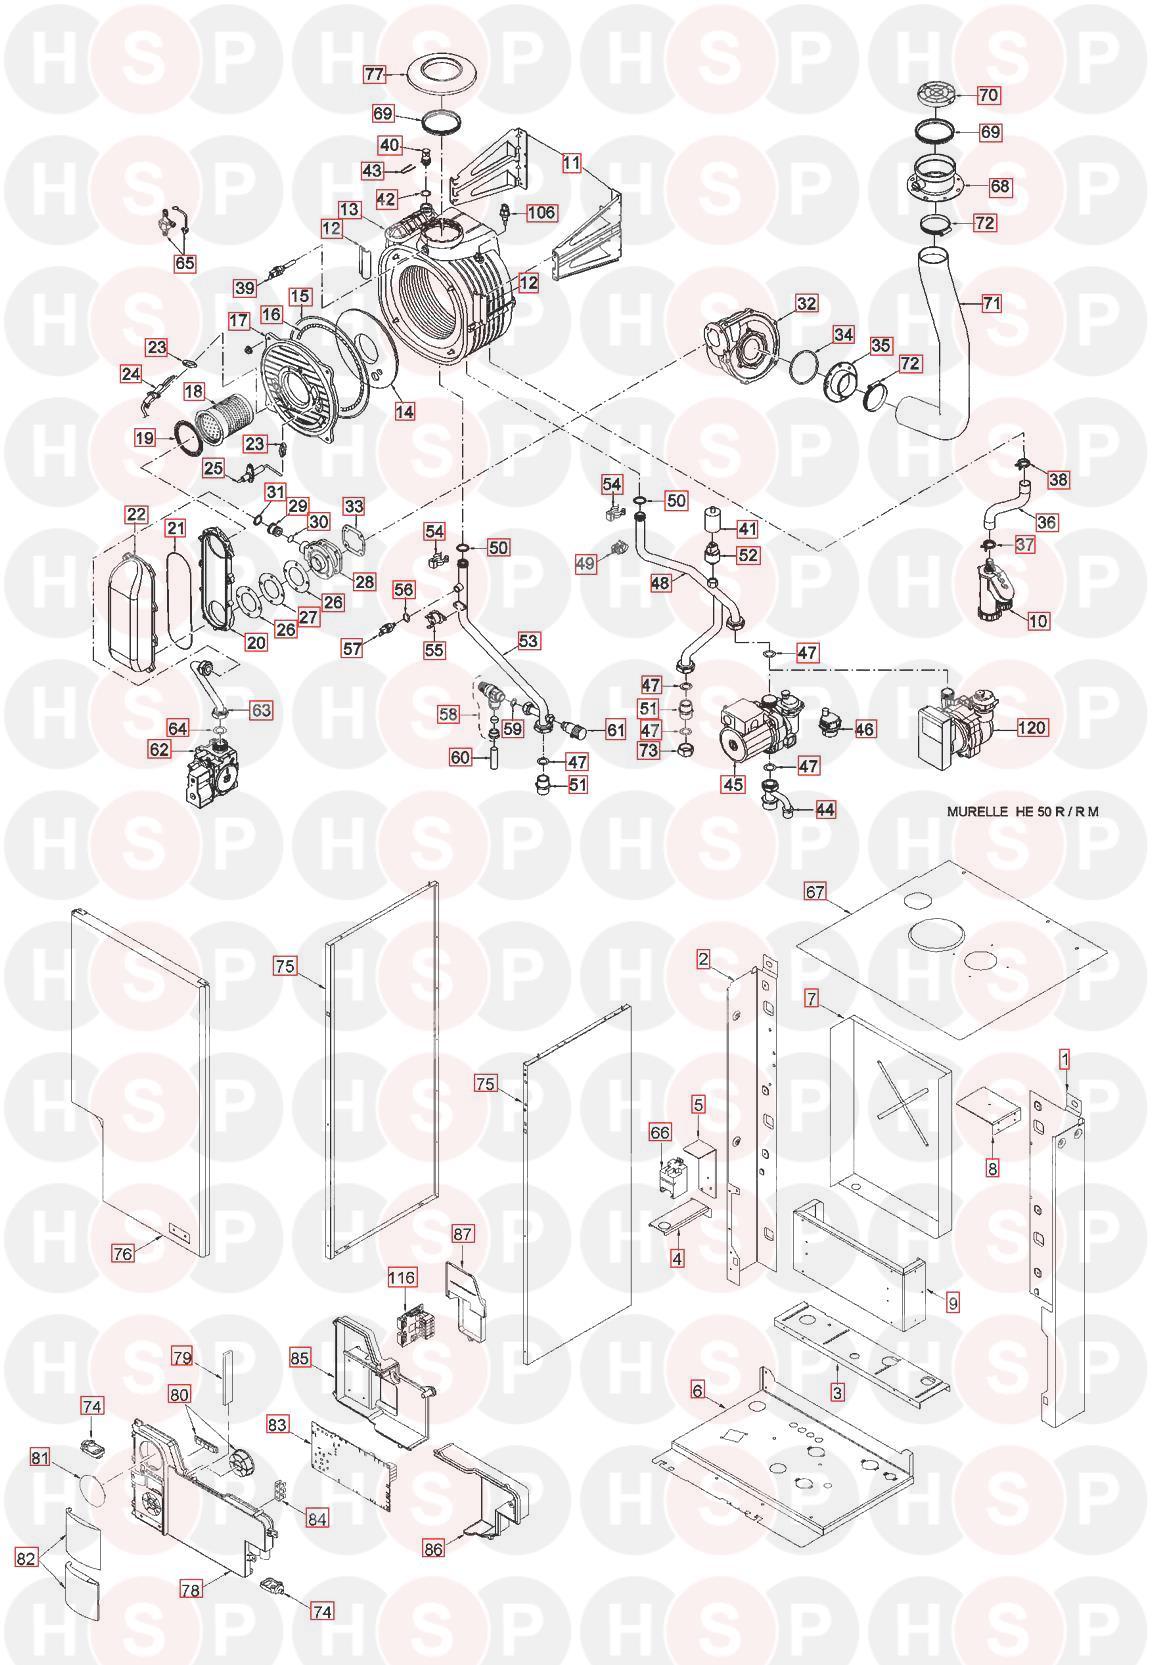 Sime he 50 r m boiler exploded view diagram heating spare parts boiler exploded view diagram for sime he 50 r m swarovskicordoba Gallery